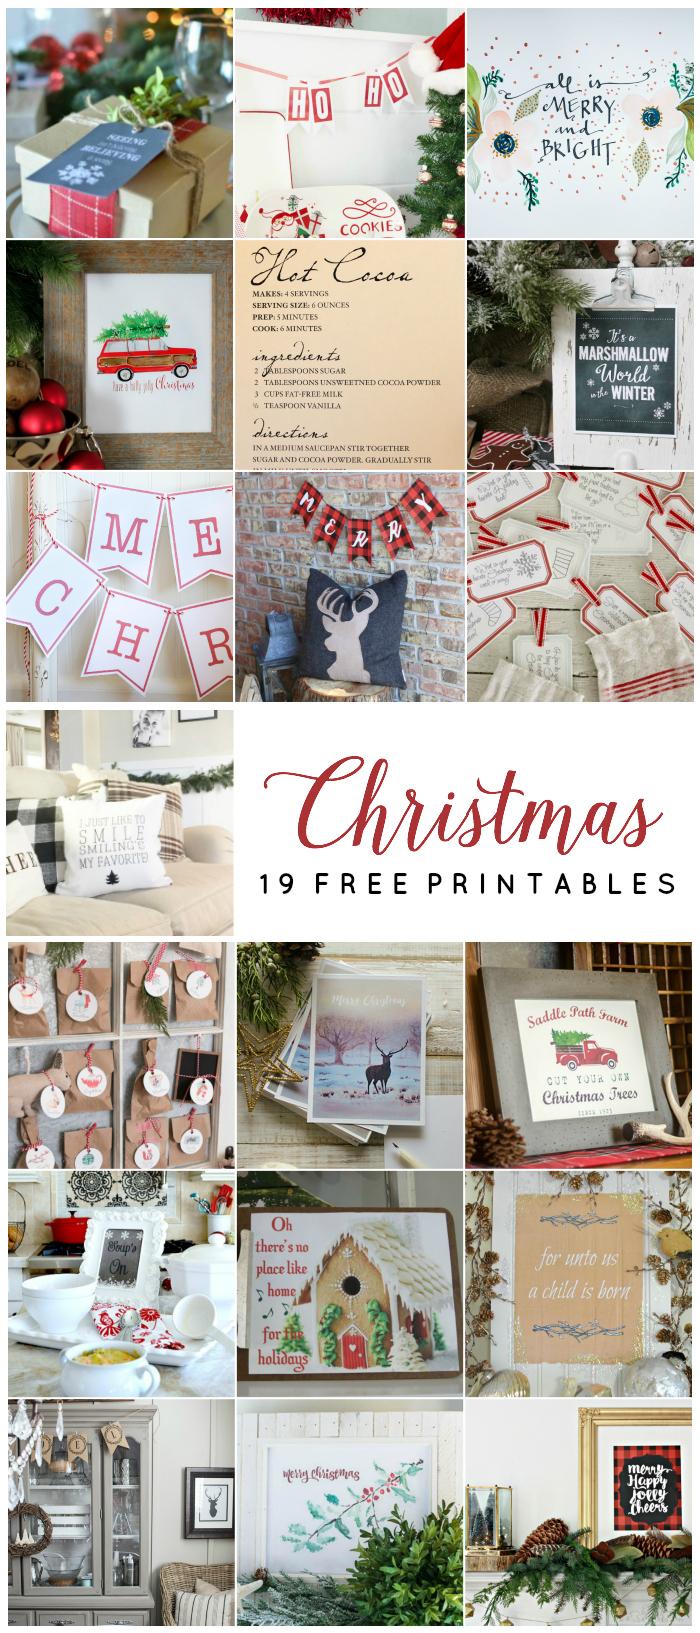 19 Fabulous Free Christmas Printables kellyelko.com